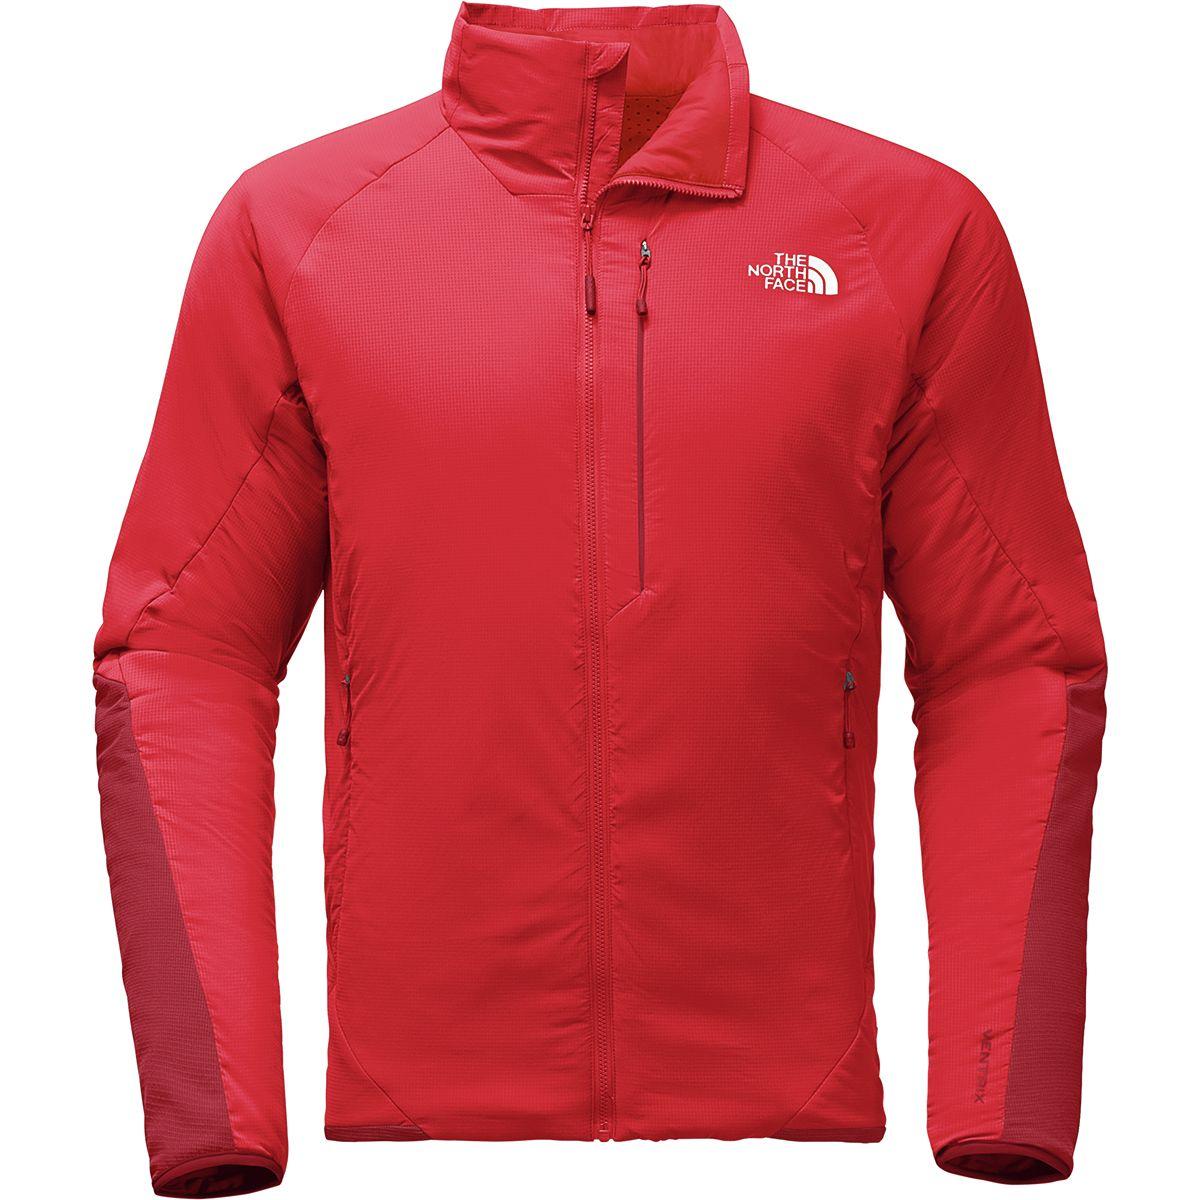 The North Face Ventrix Jacket